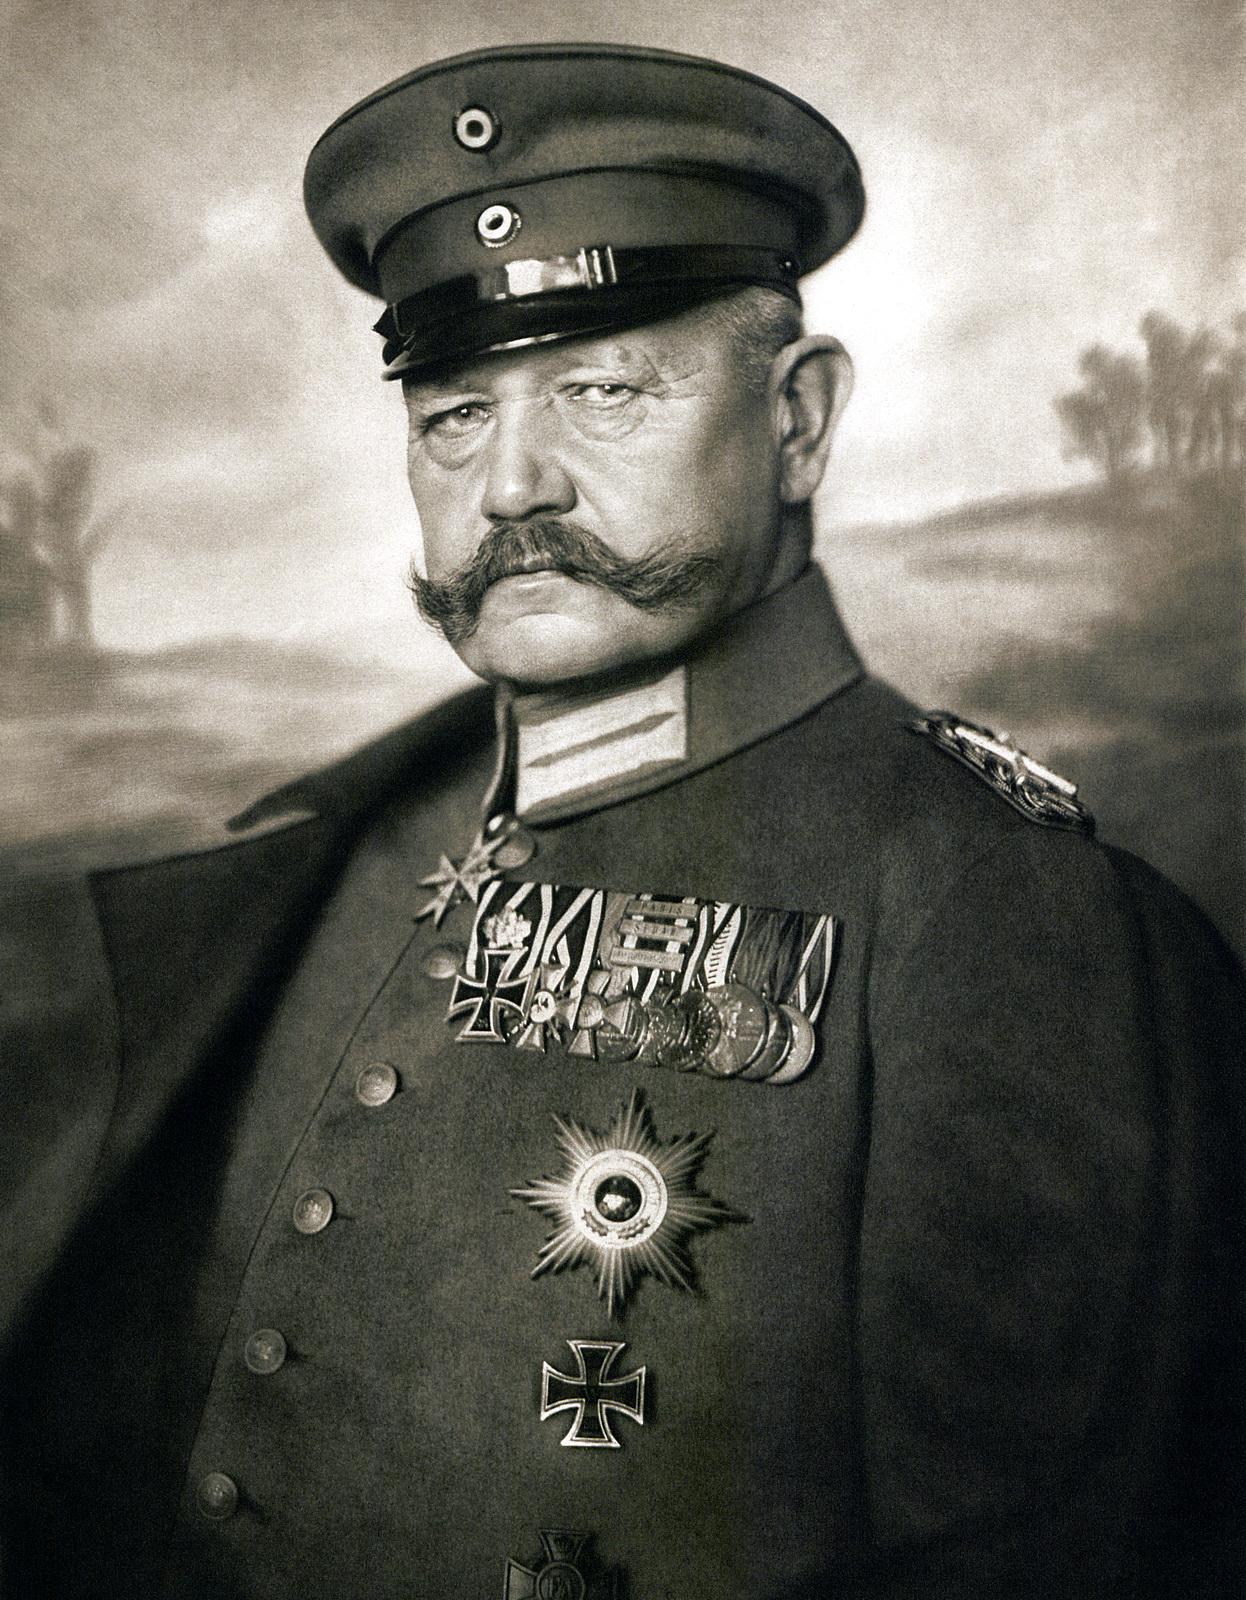 Paul Ludwig Hans Anton von Beneckendorff und von Hindenburg 2 Oktober 1847 – 2 Agustus 1934 adalah jenderal dan politisi Jerman terkemuka veteran Perang